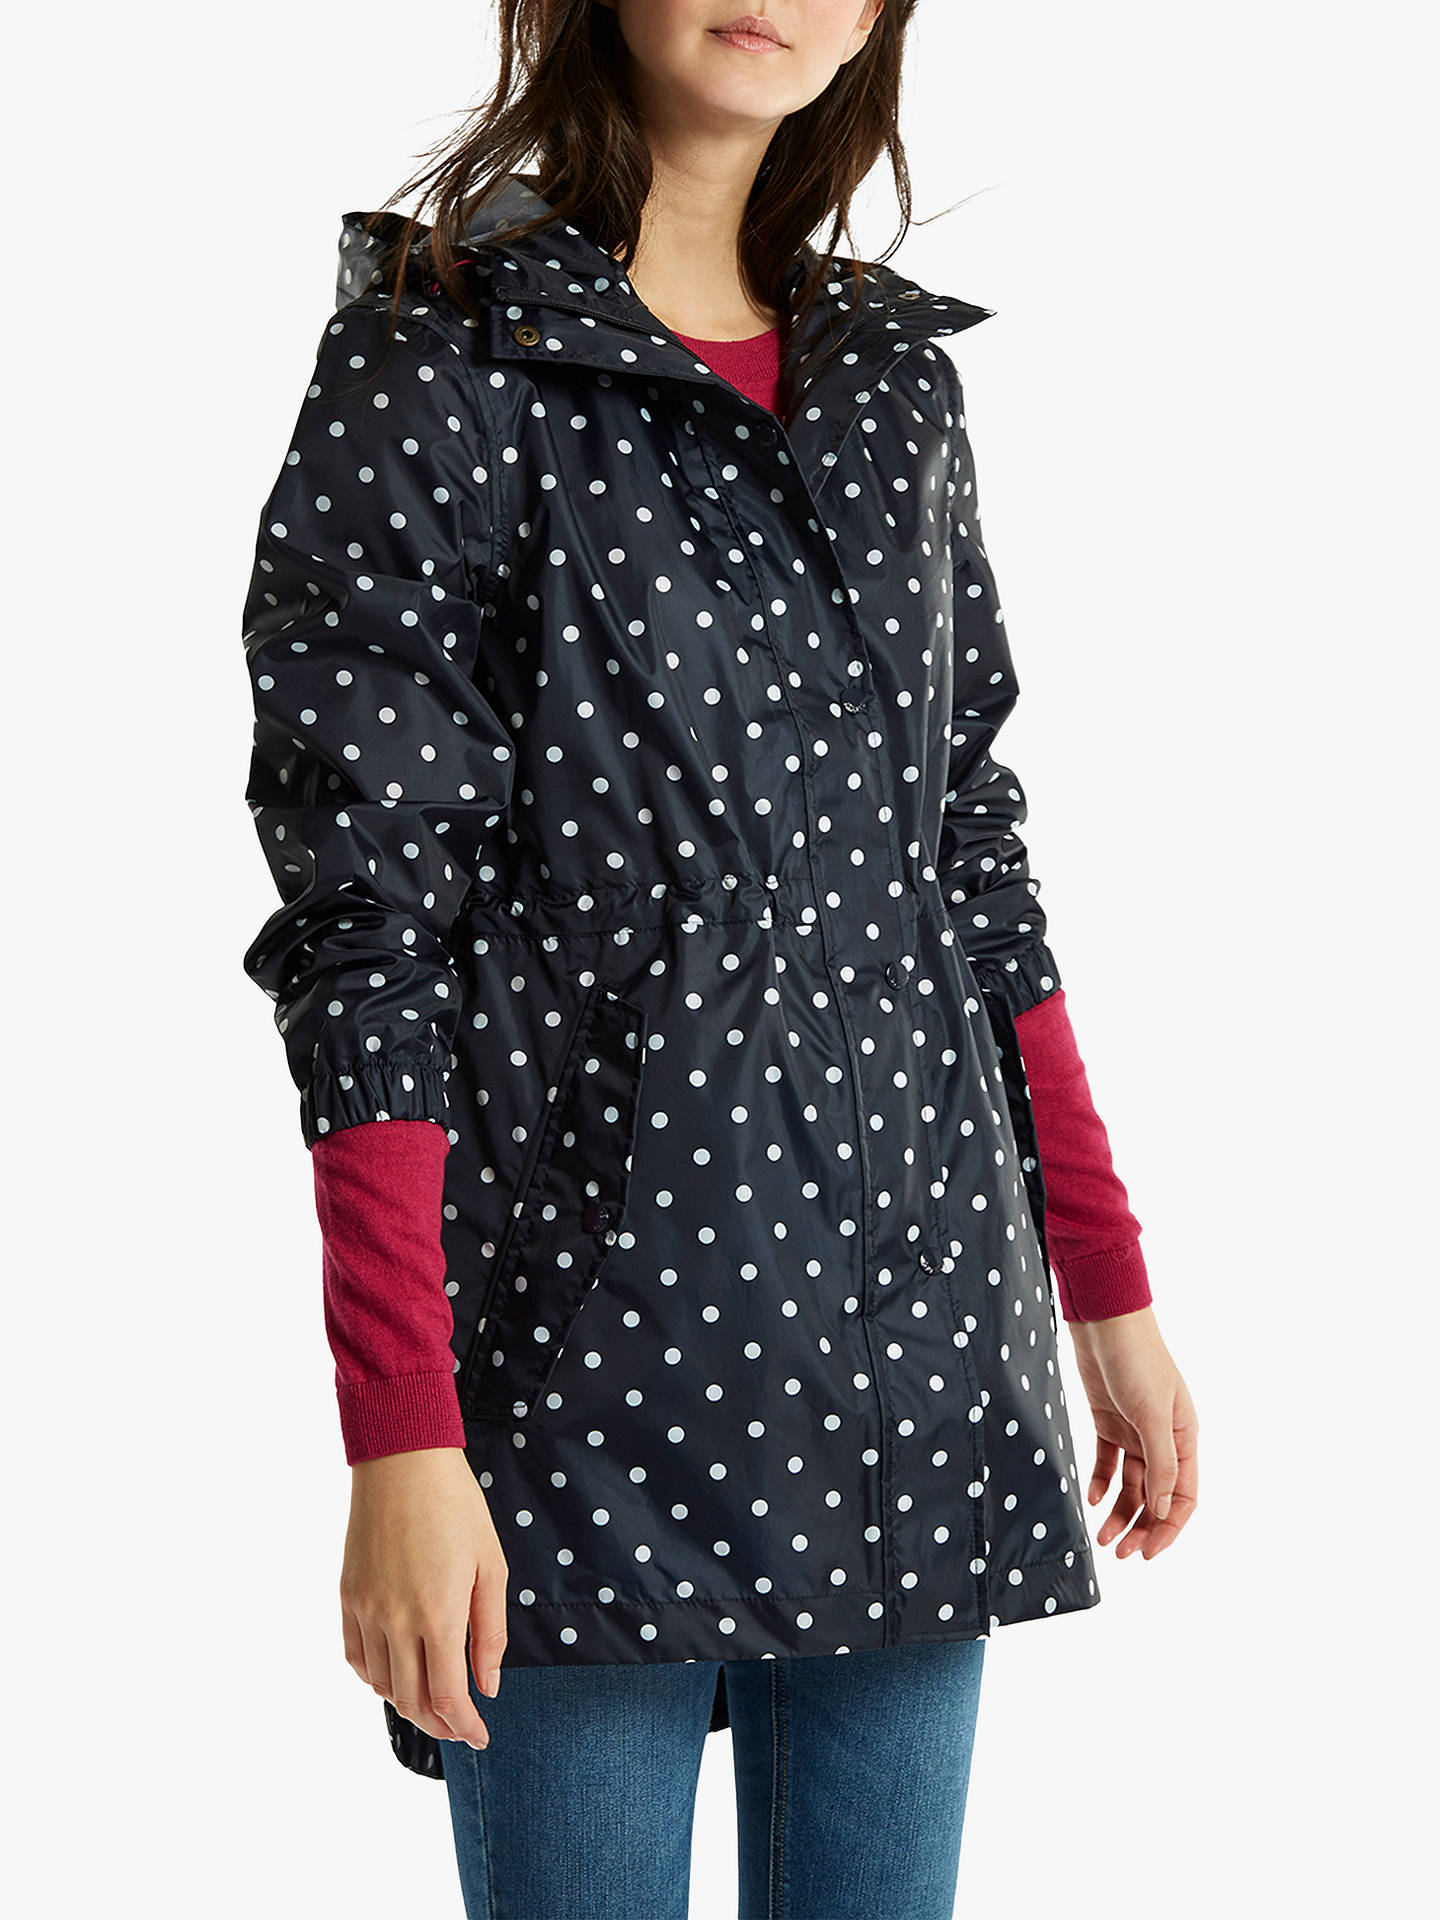 3261074add36 Joules Golightly Pack-Away Waterproof Spot Print Parka Coat at John ...